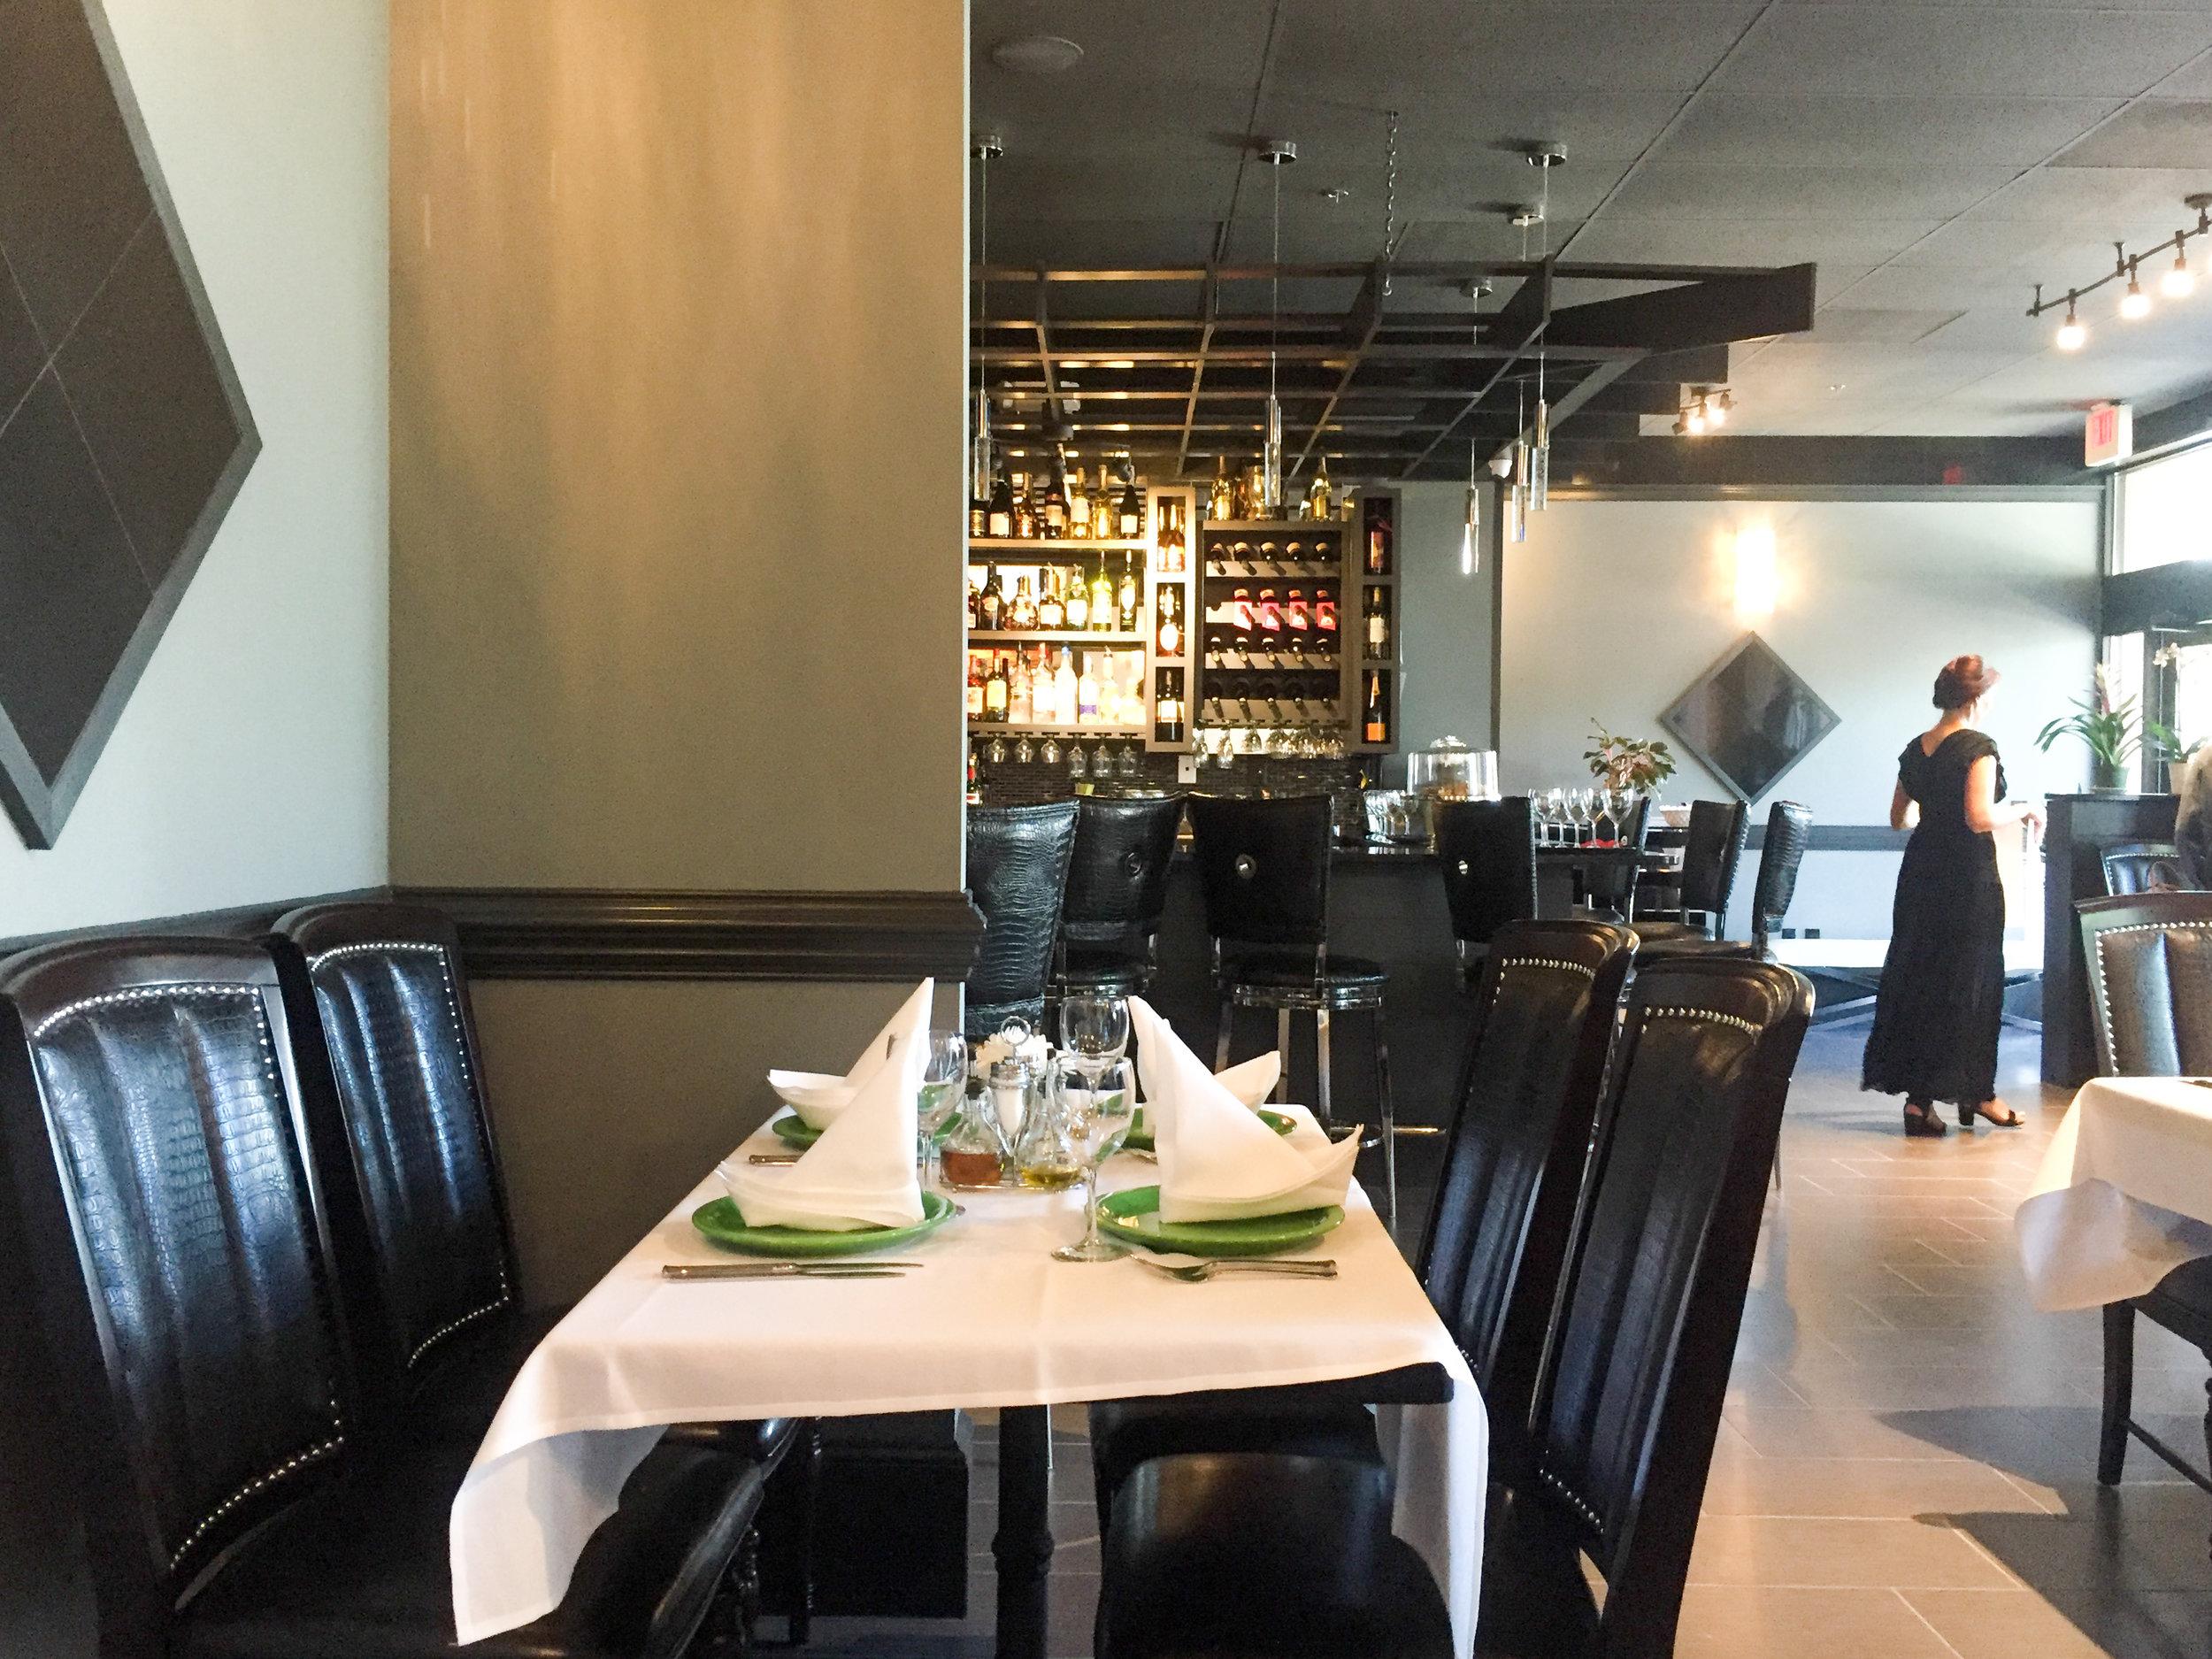 ararat17-matthews-charlotte-nc-armenian-restaurant-interior